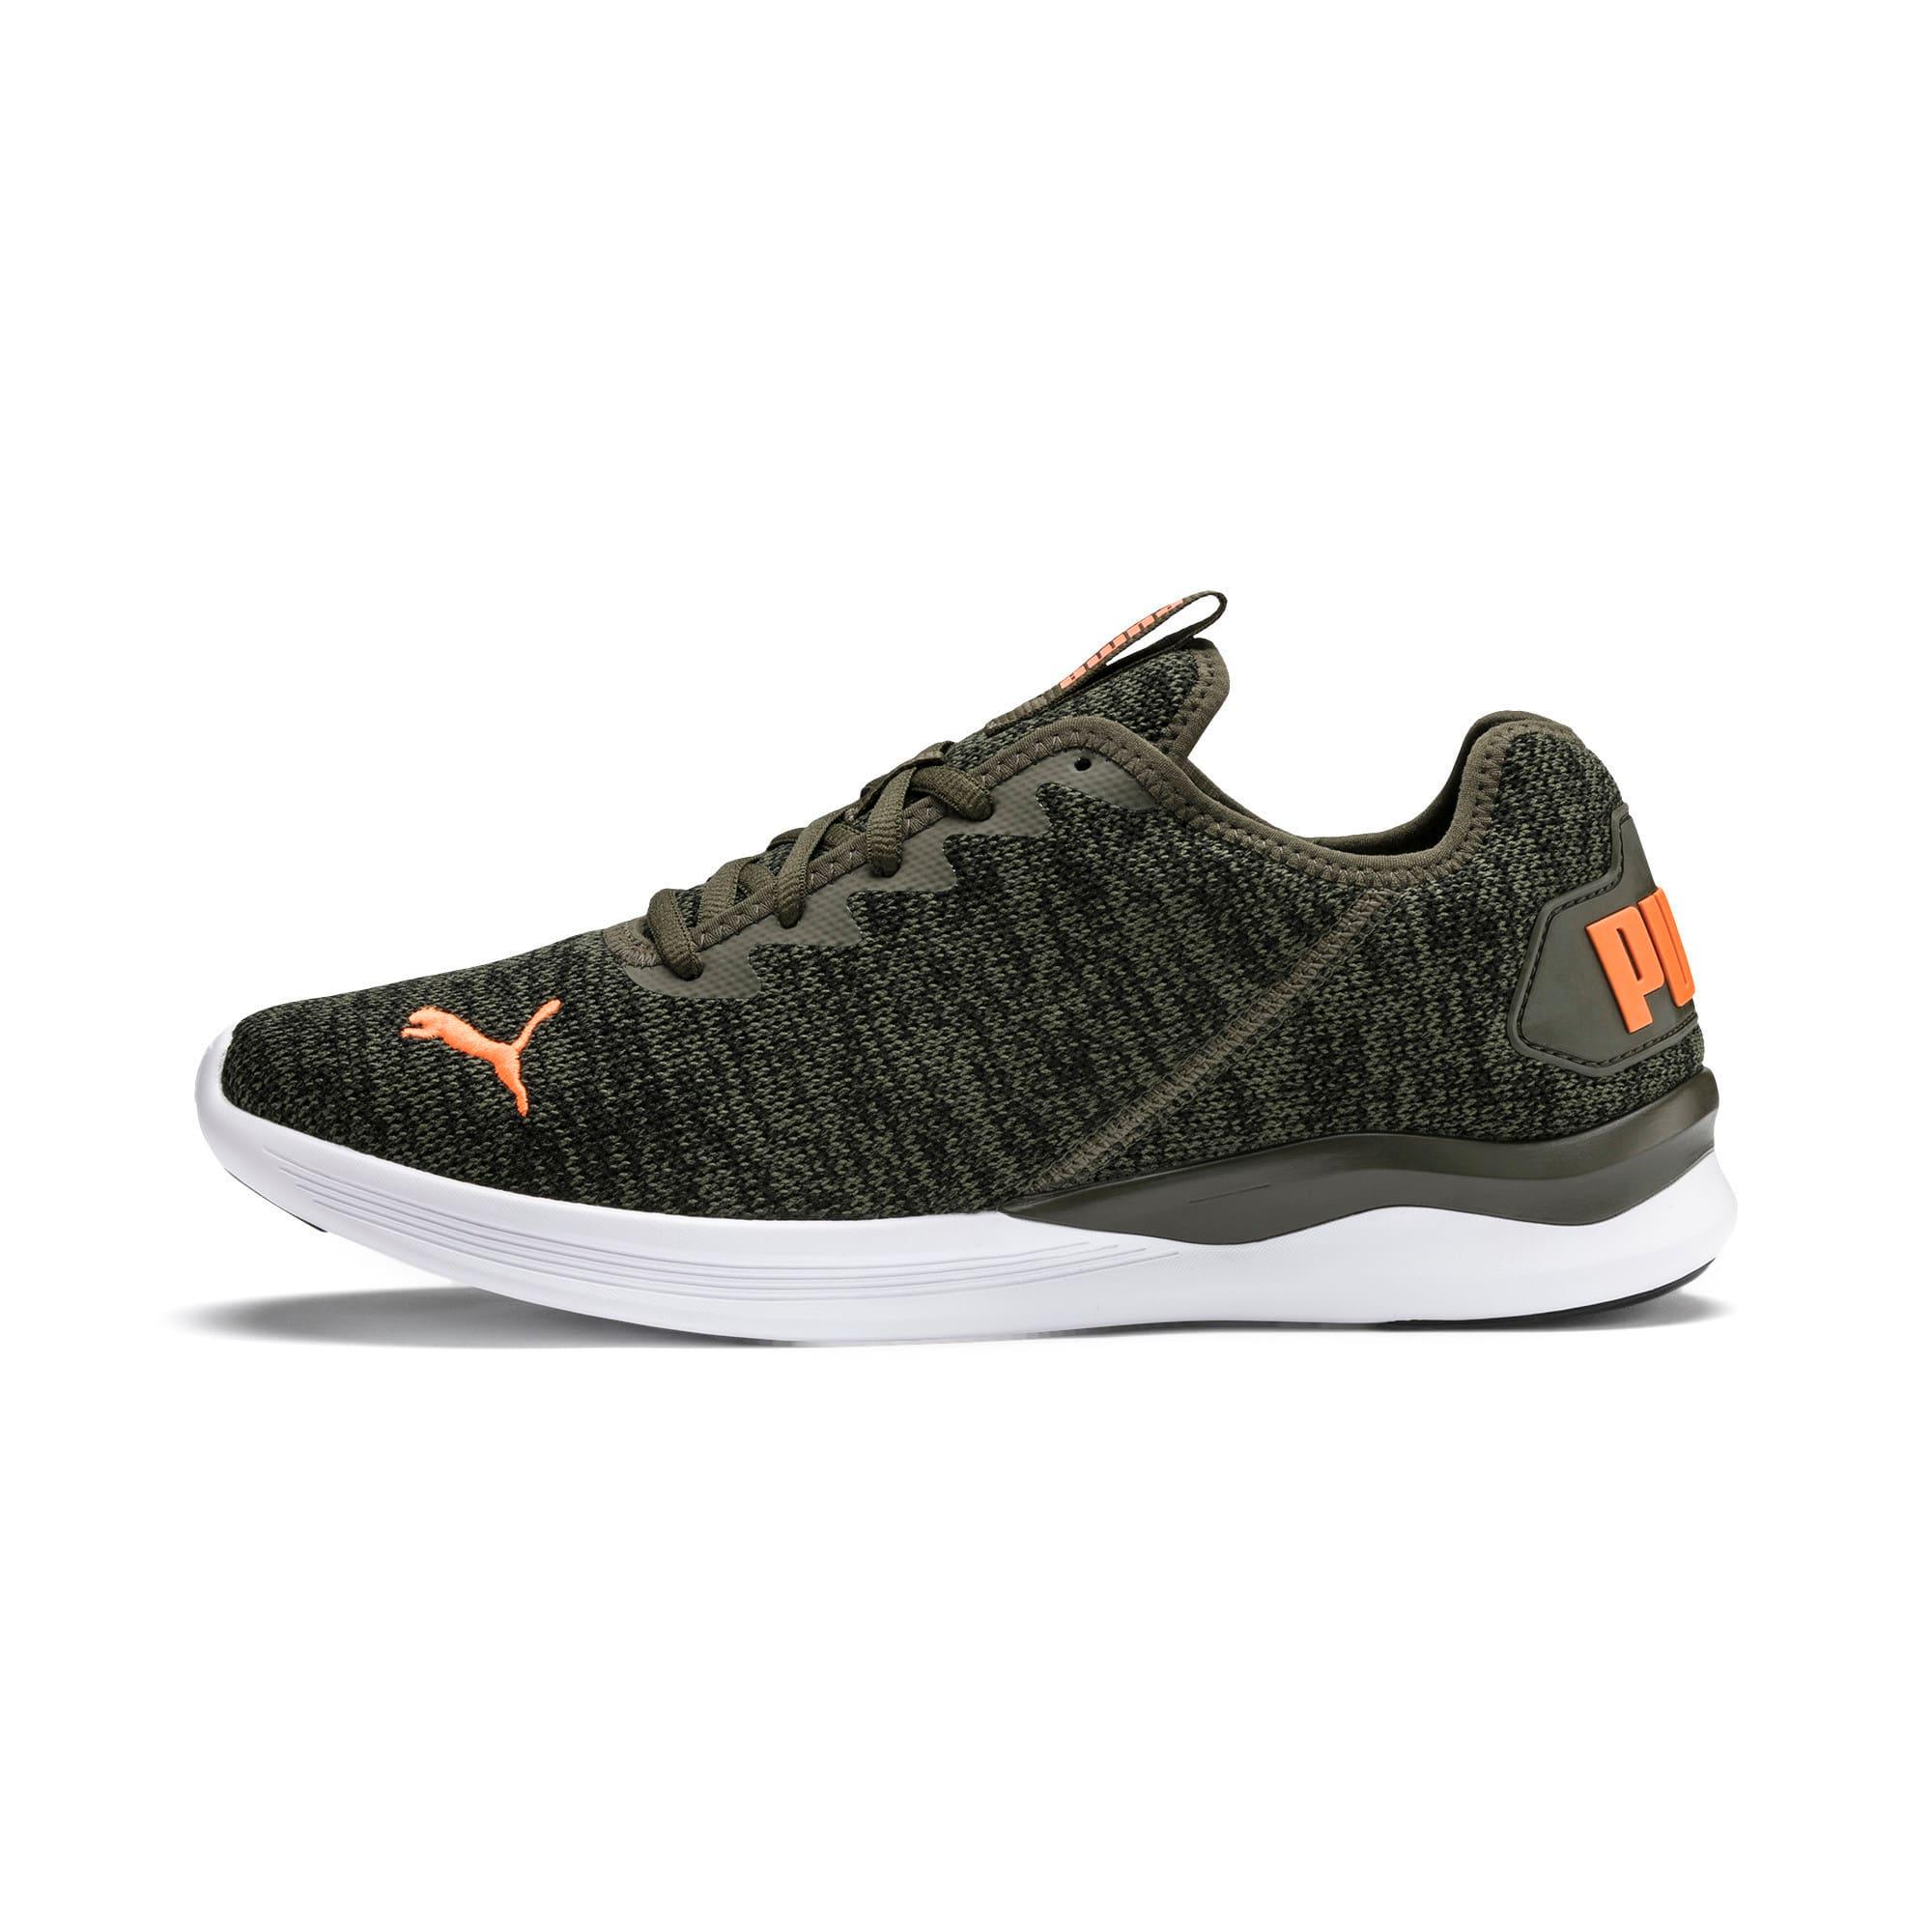 Thumbnail 1 of Ballast Men's Running Shoes, Forest Night-Black-Orange, medium-IND